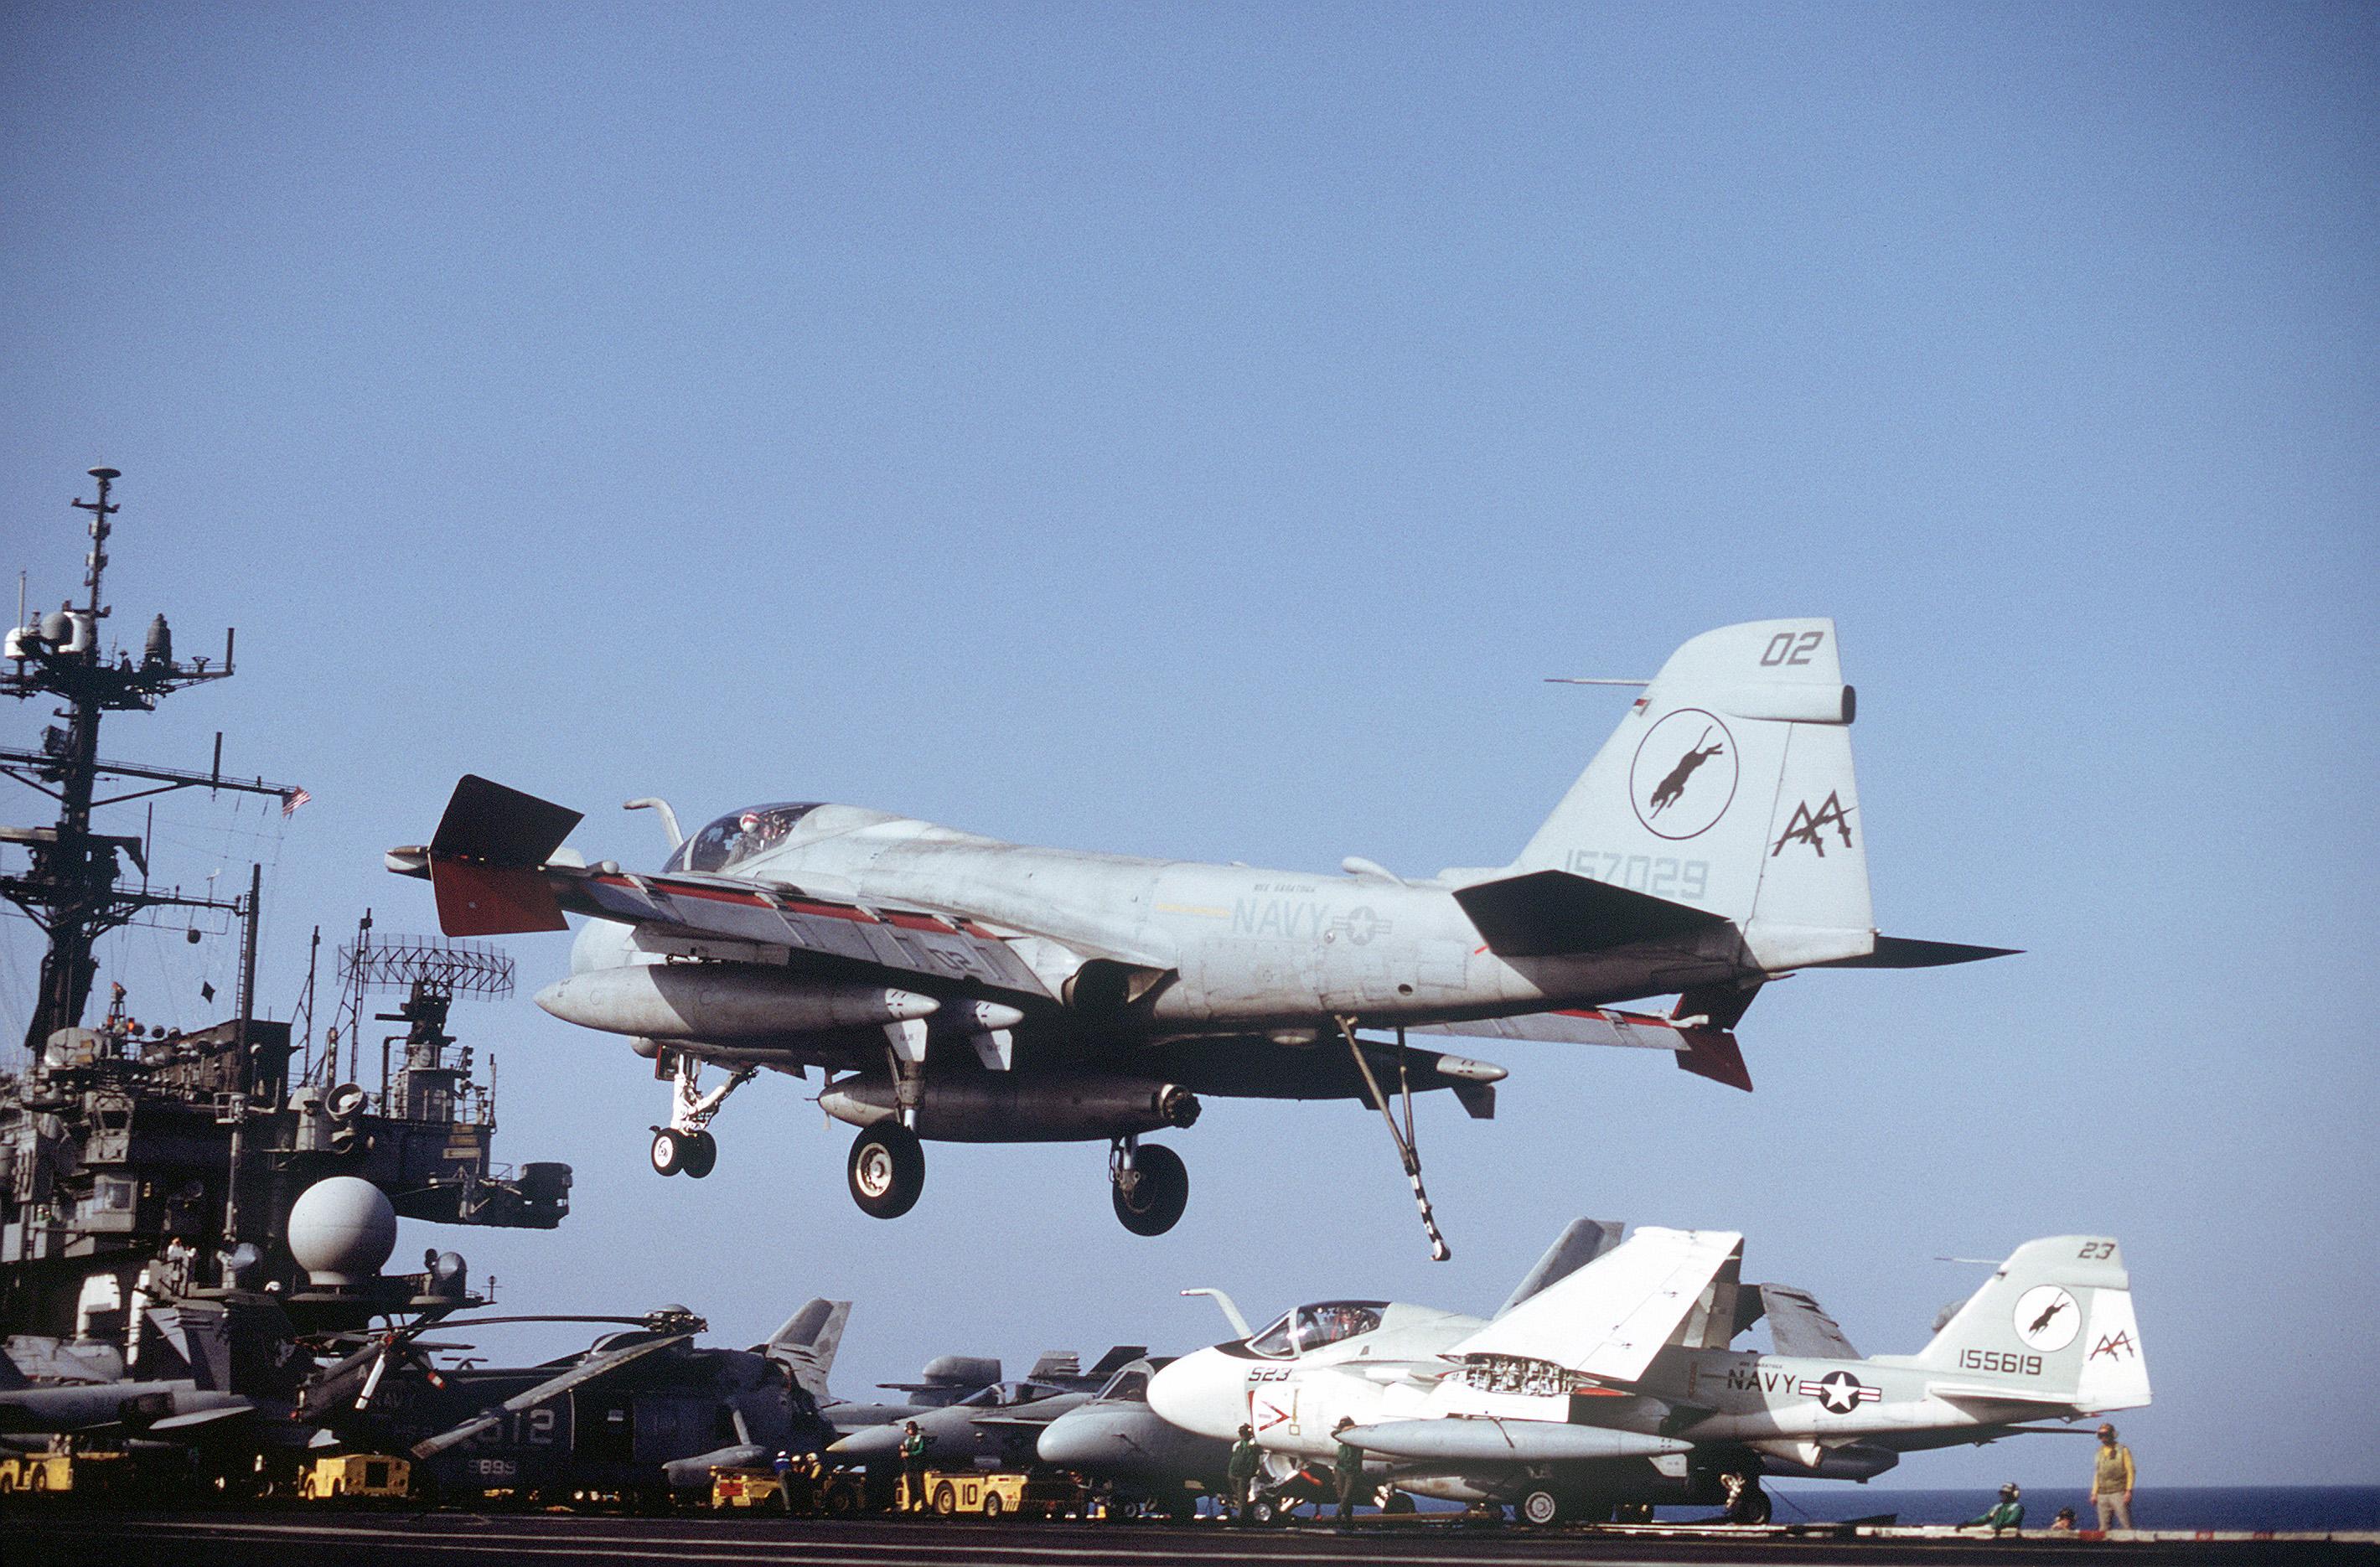 An Attack Squadron 35 (VA-35) A-6E Intruder aircraft lands on the aircraft carrier USS SARATOGA (CV-60)